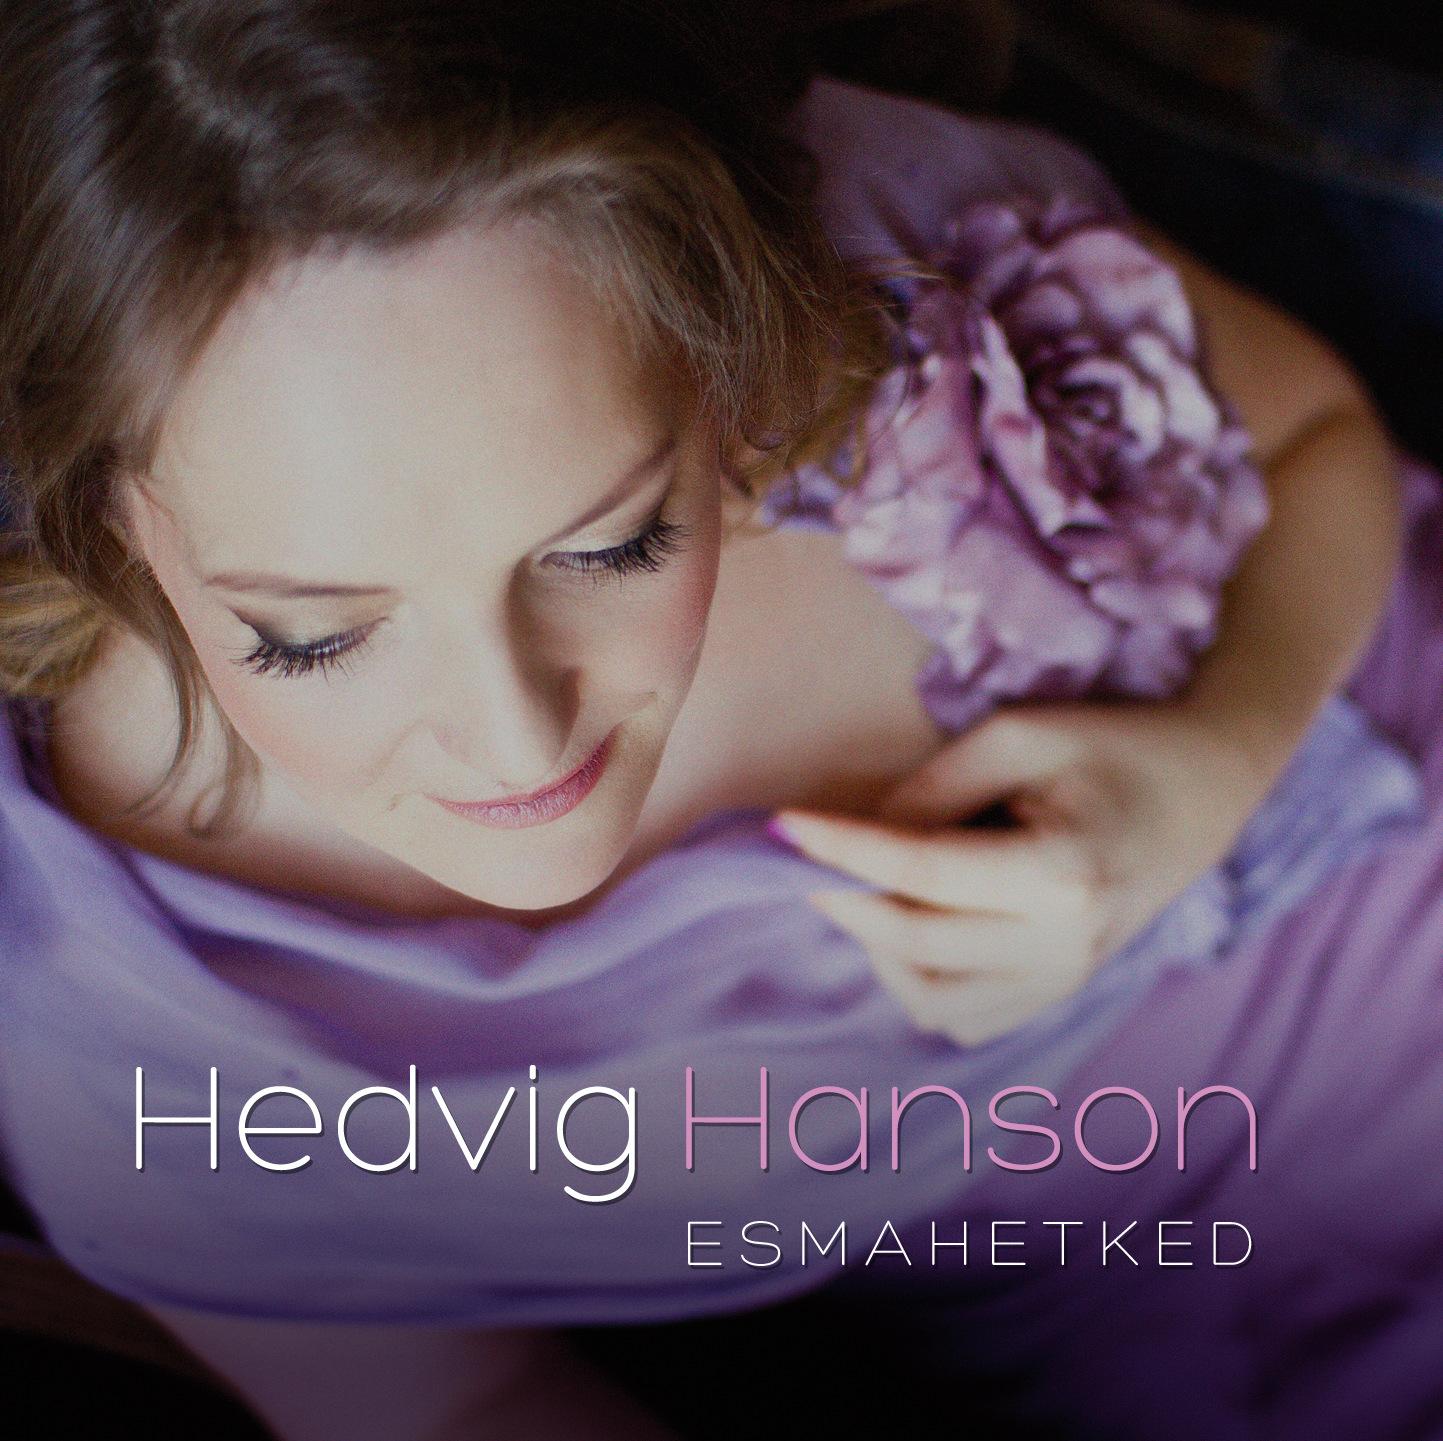 Hedvig Hanson - Esmahetked